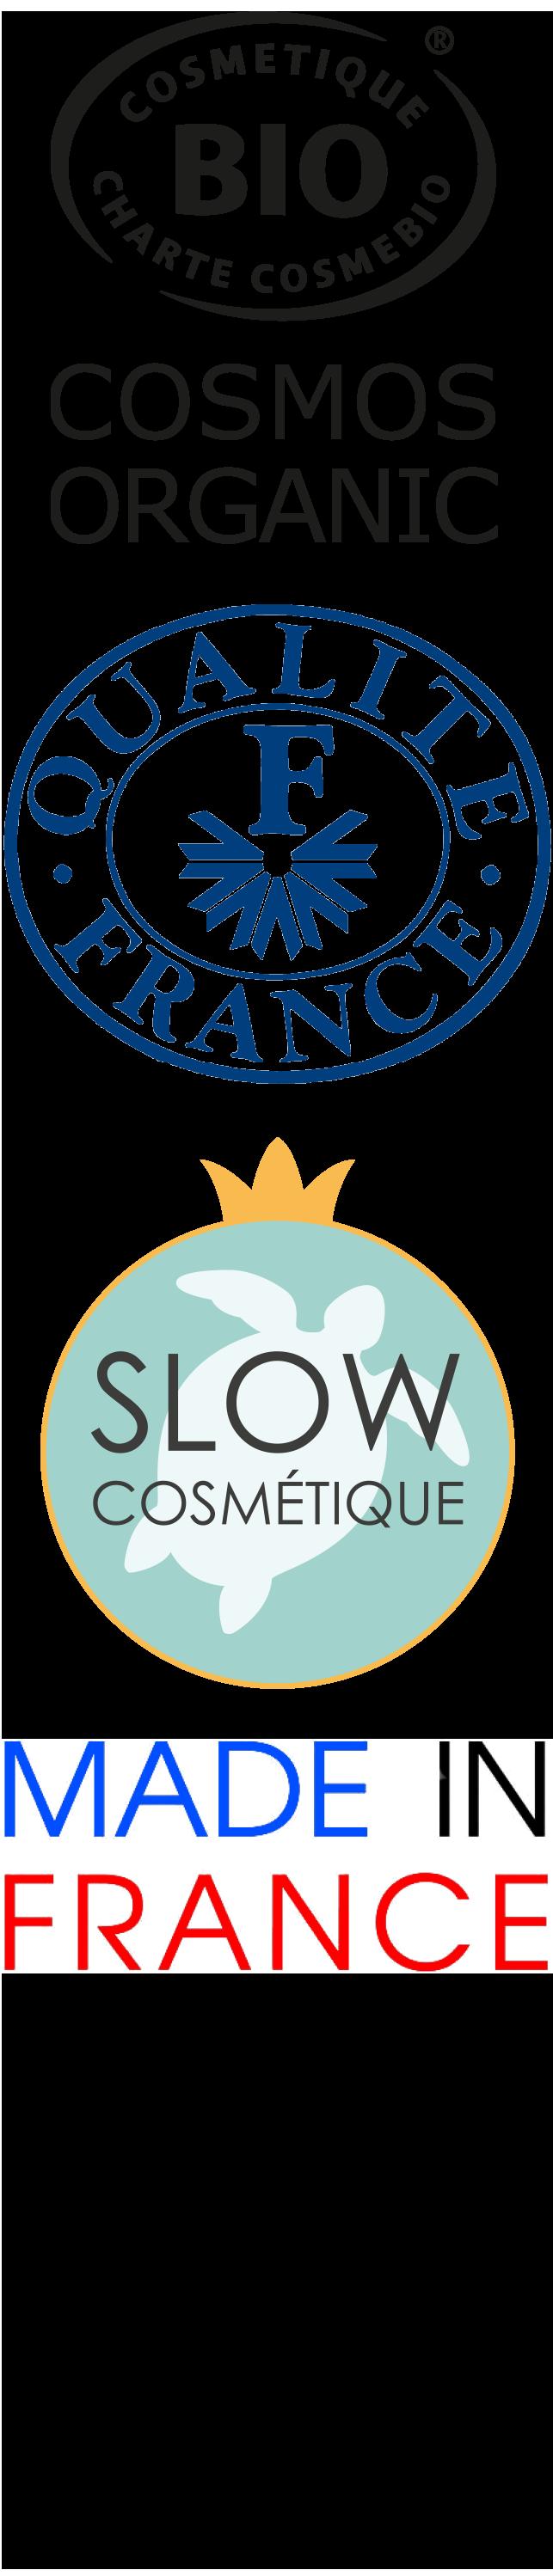 Cosmetiques organiques Non testé sur animaux Qualité France Slow Cosmetics Made in France